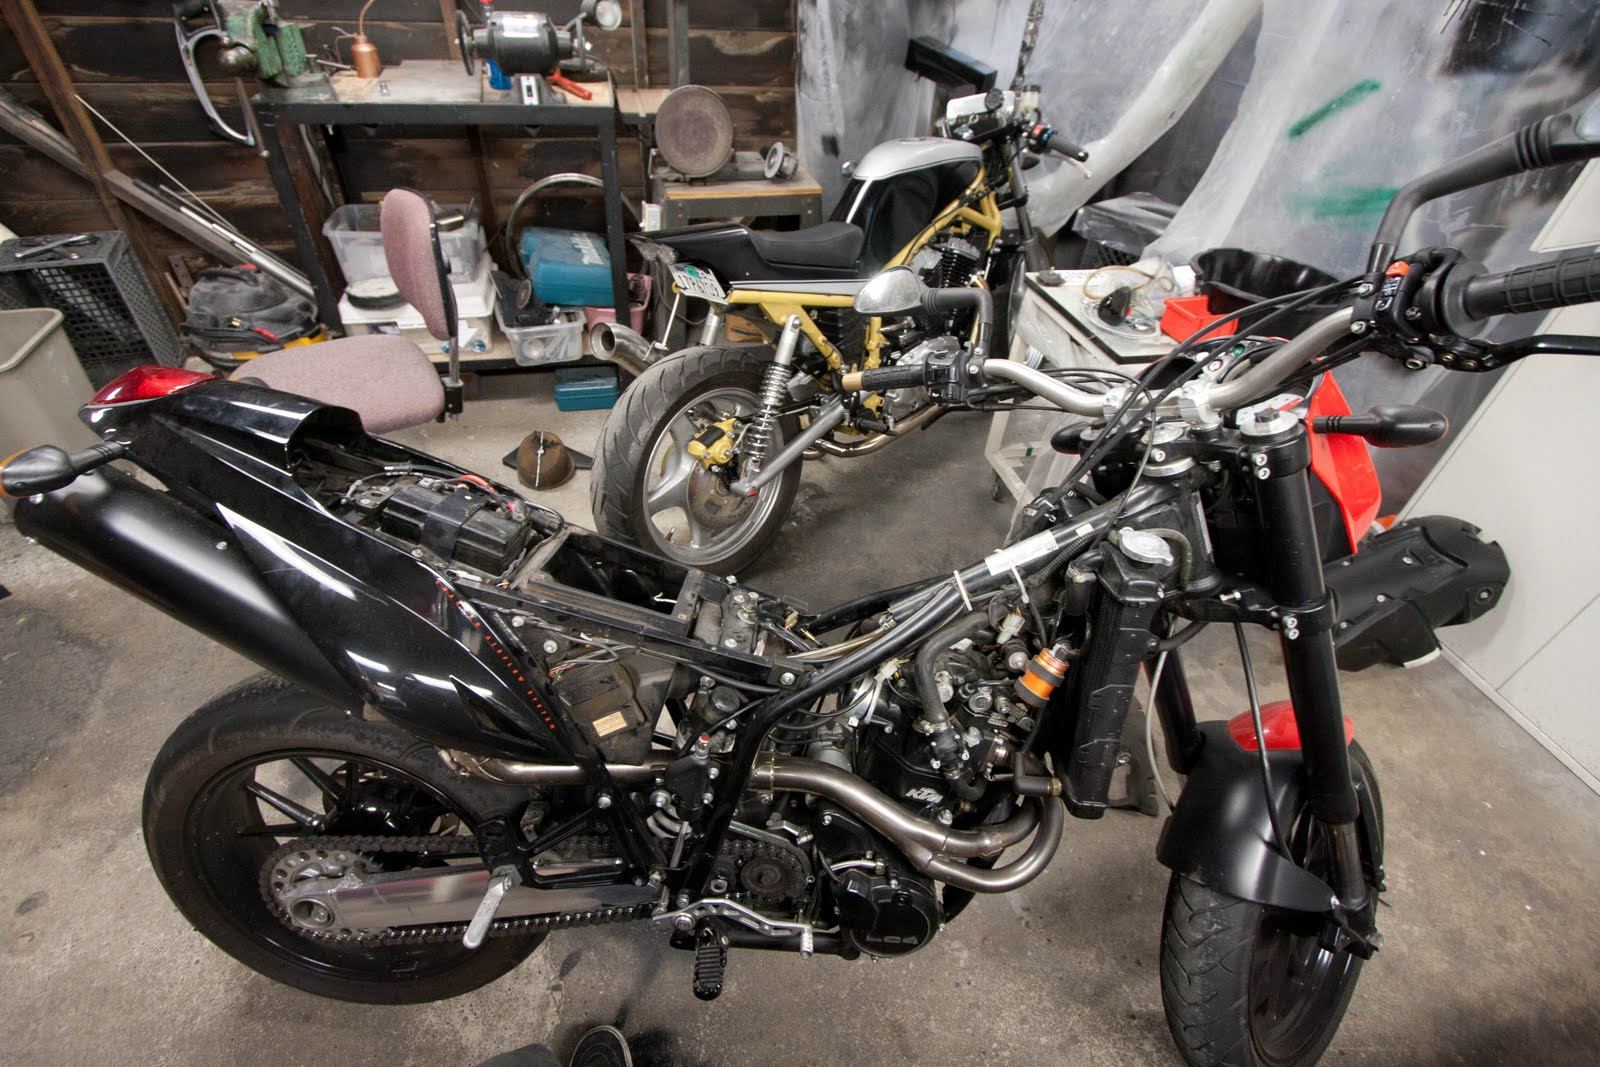 Suzuki VX800 Restoration Project: Photos from the past 2 weeks